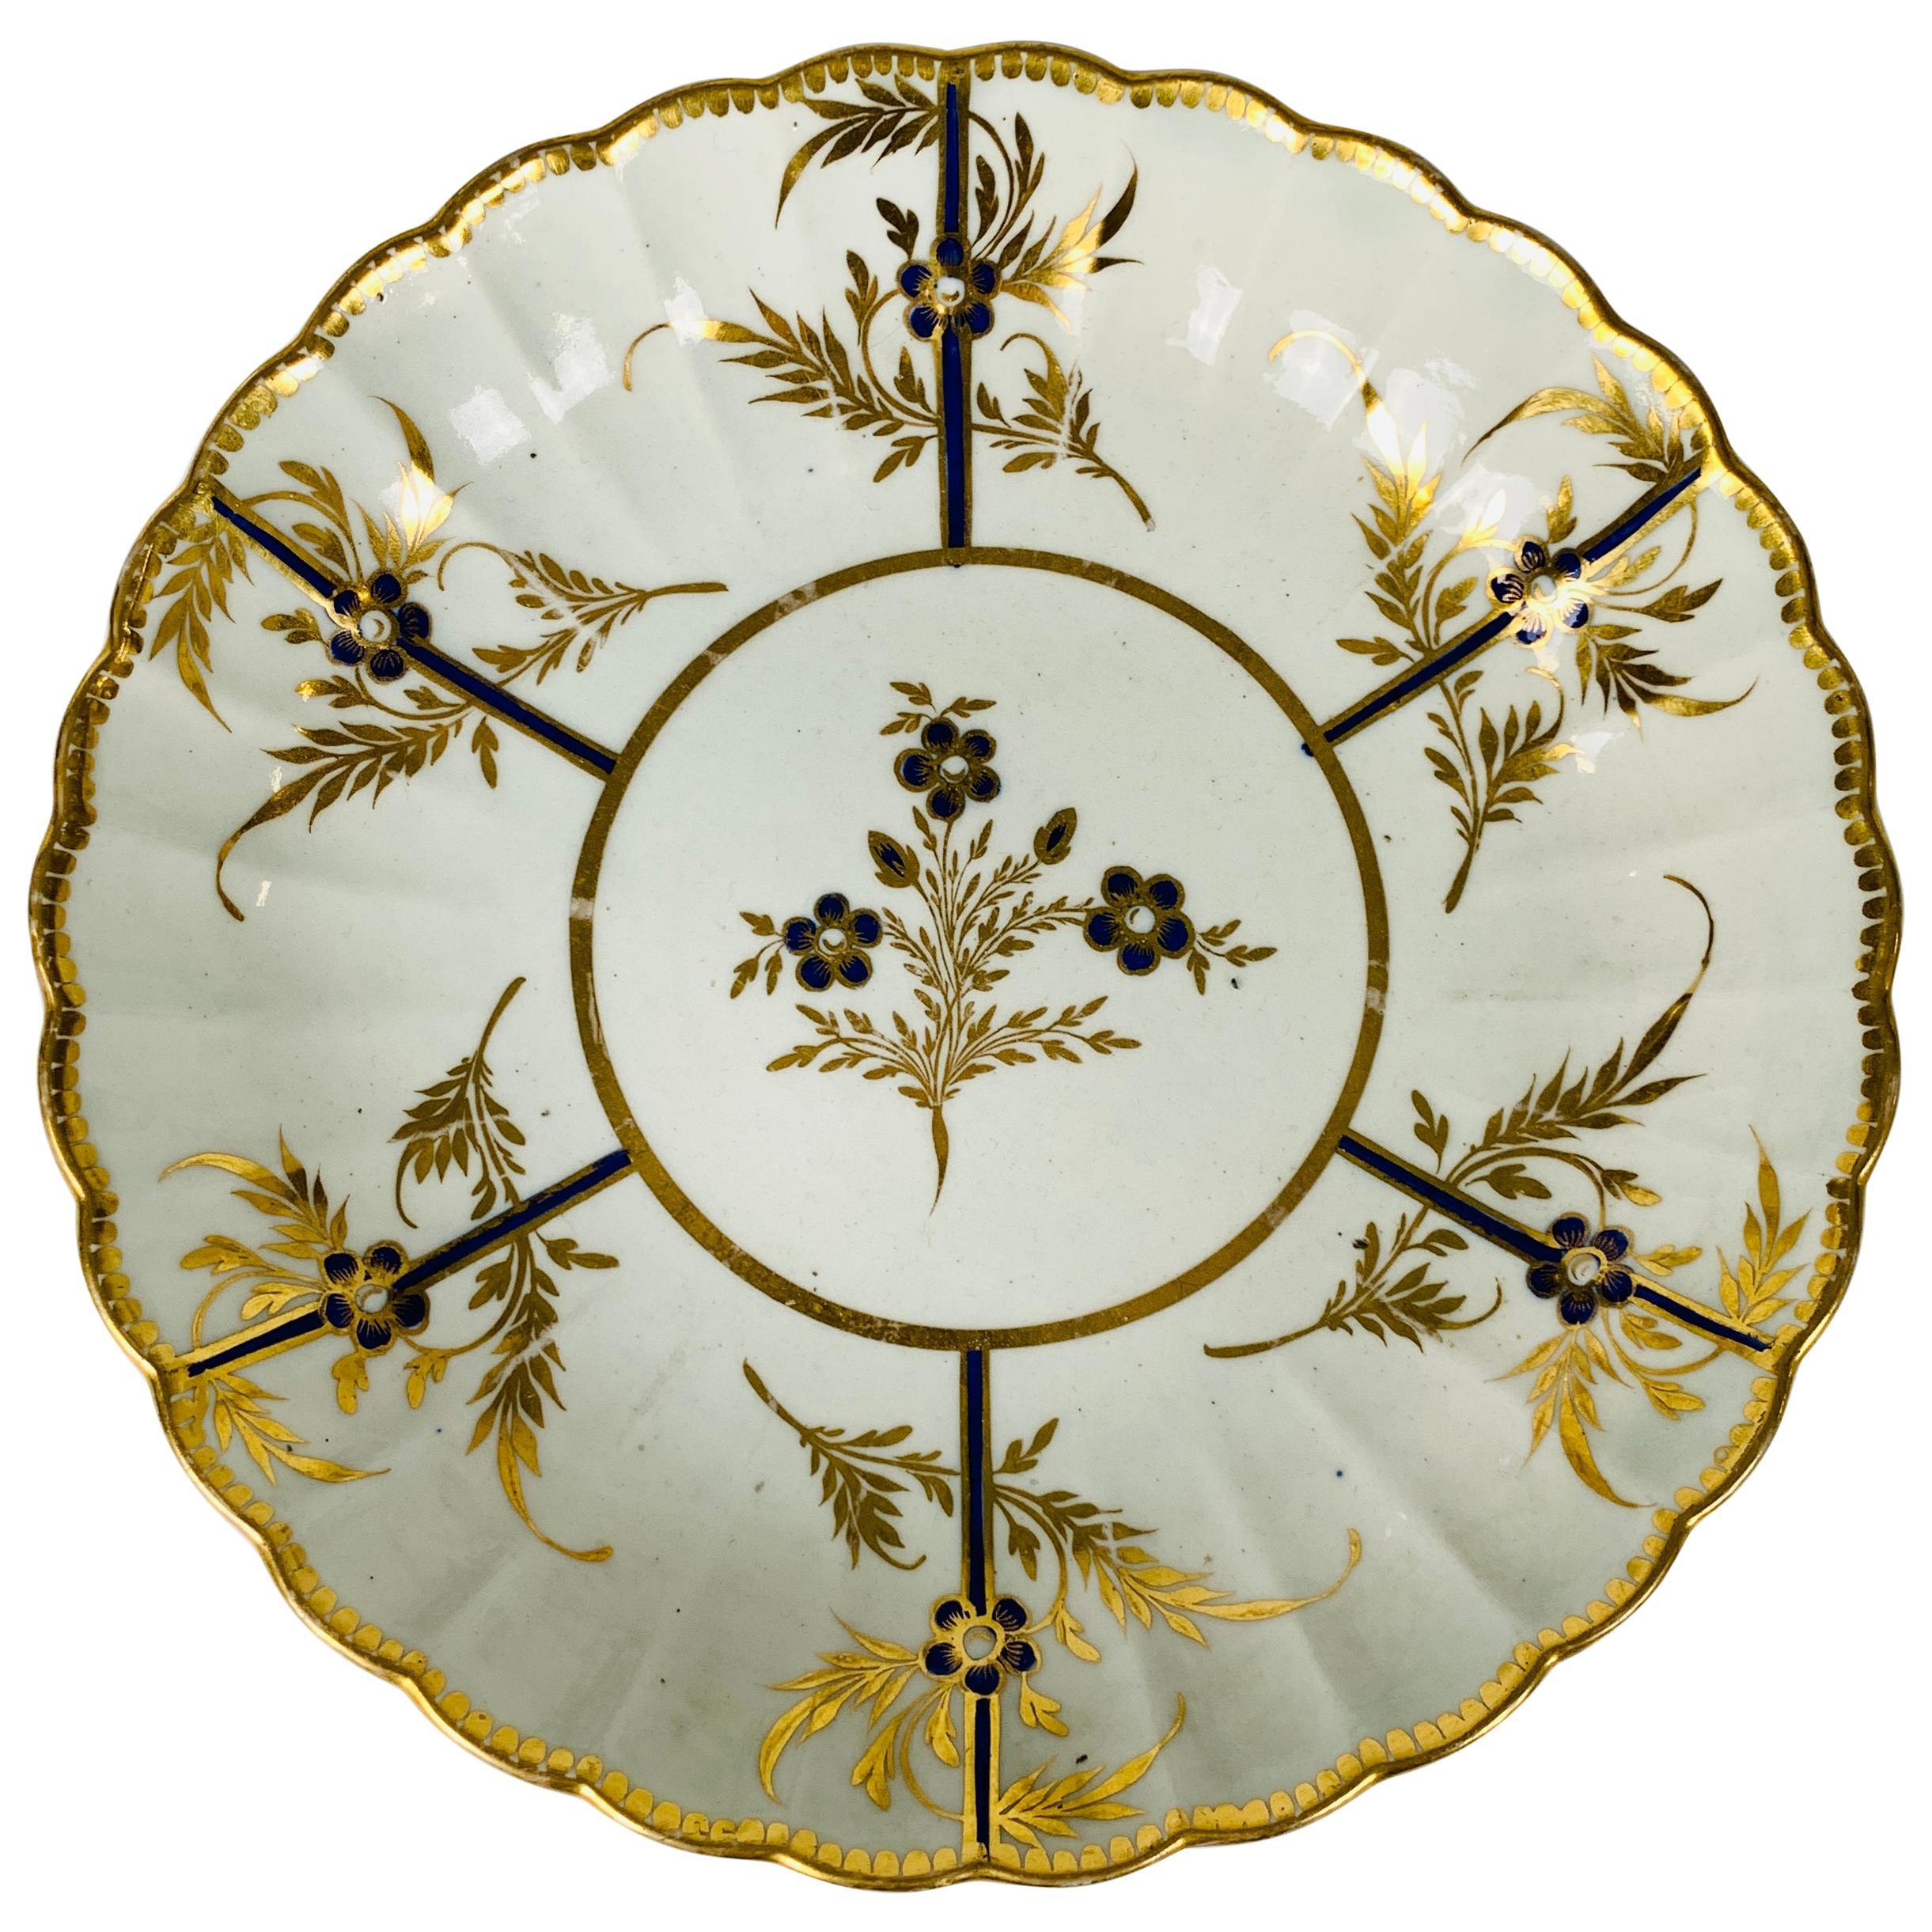 Hand-Painted Antique Blue & Gold English Porcelain Dish 18th Century c-1780